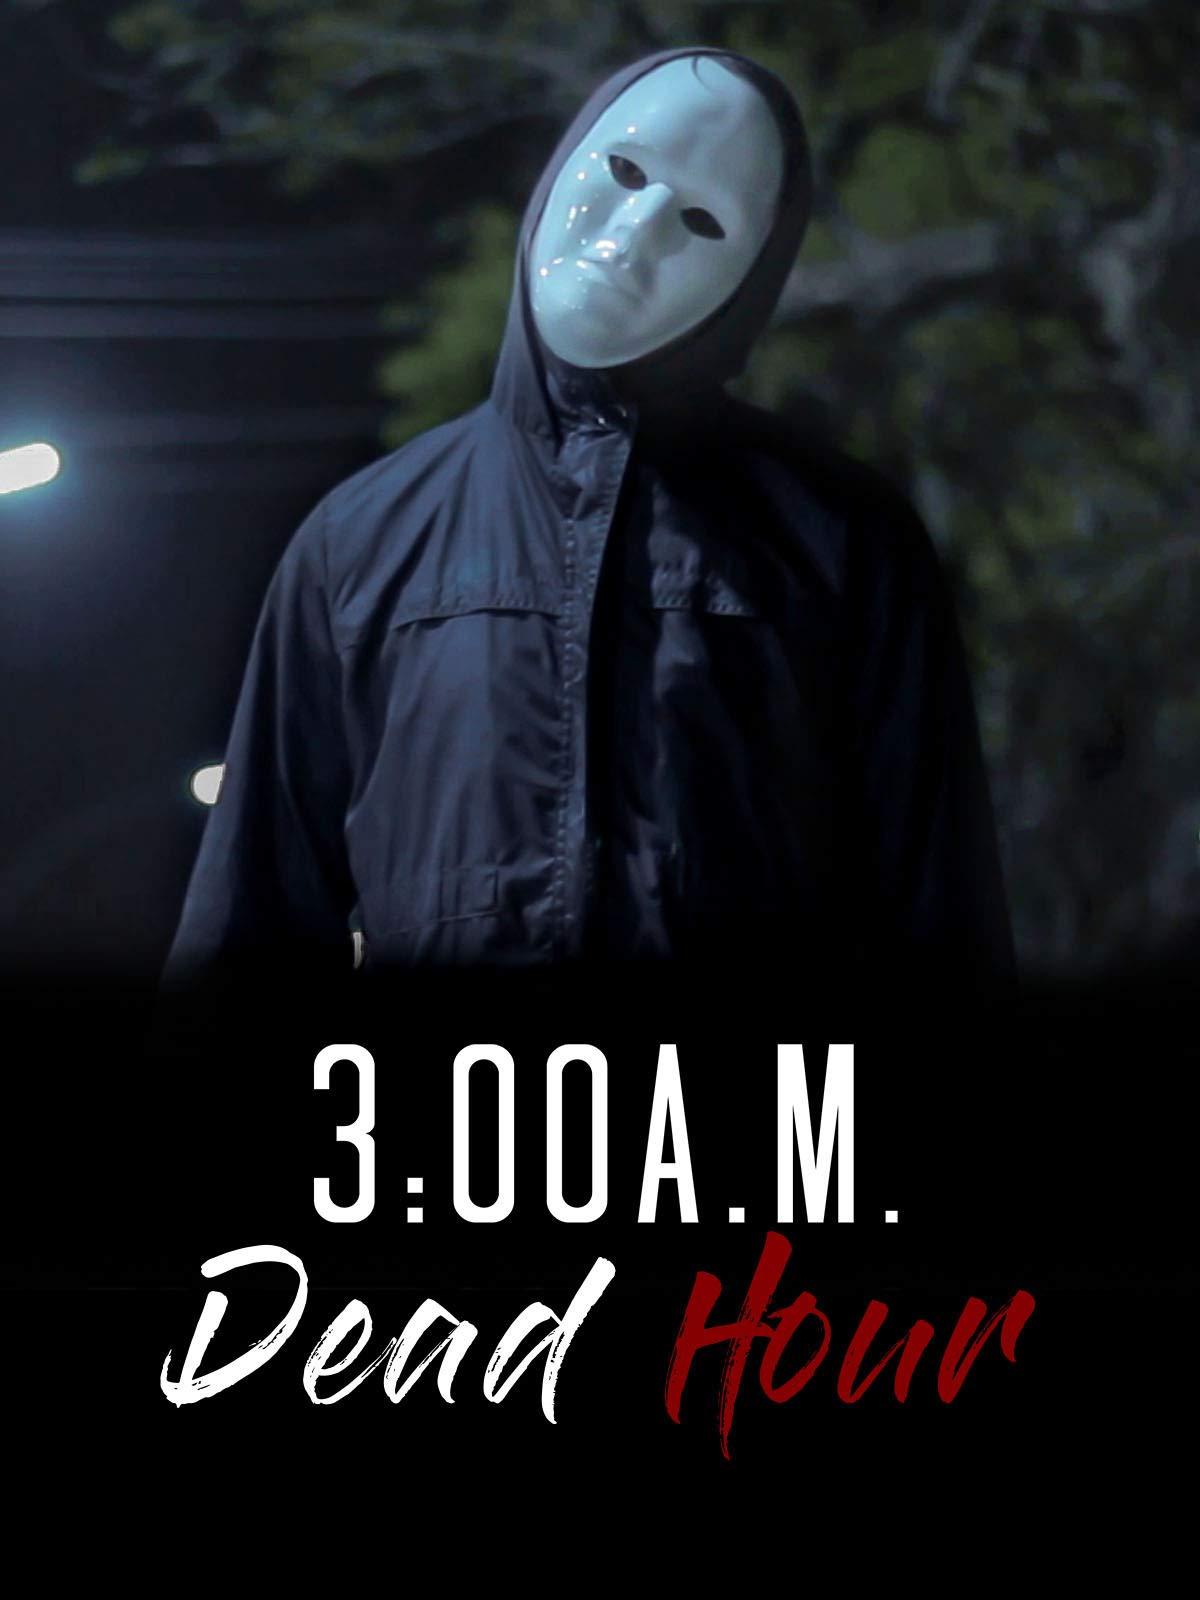 3:00 A.M. Dead Hour